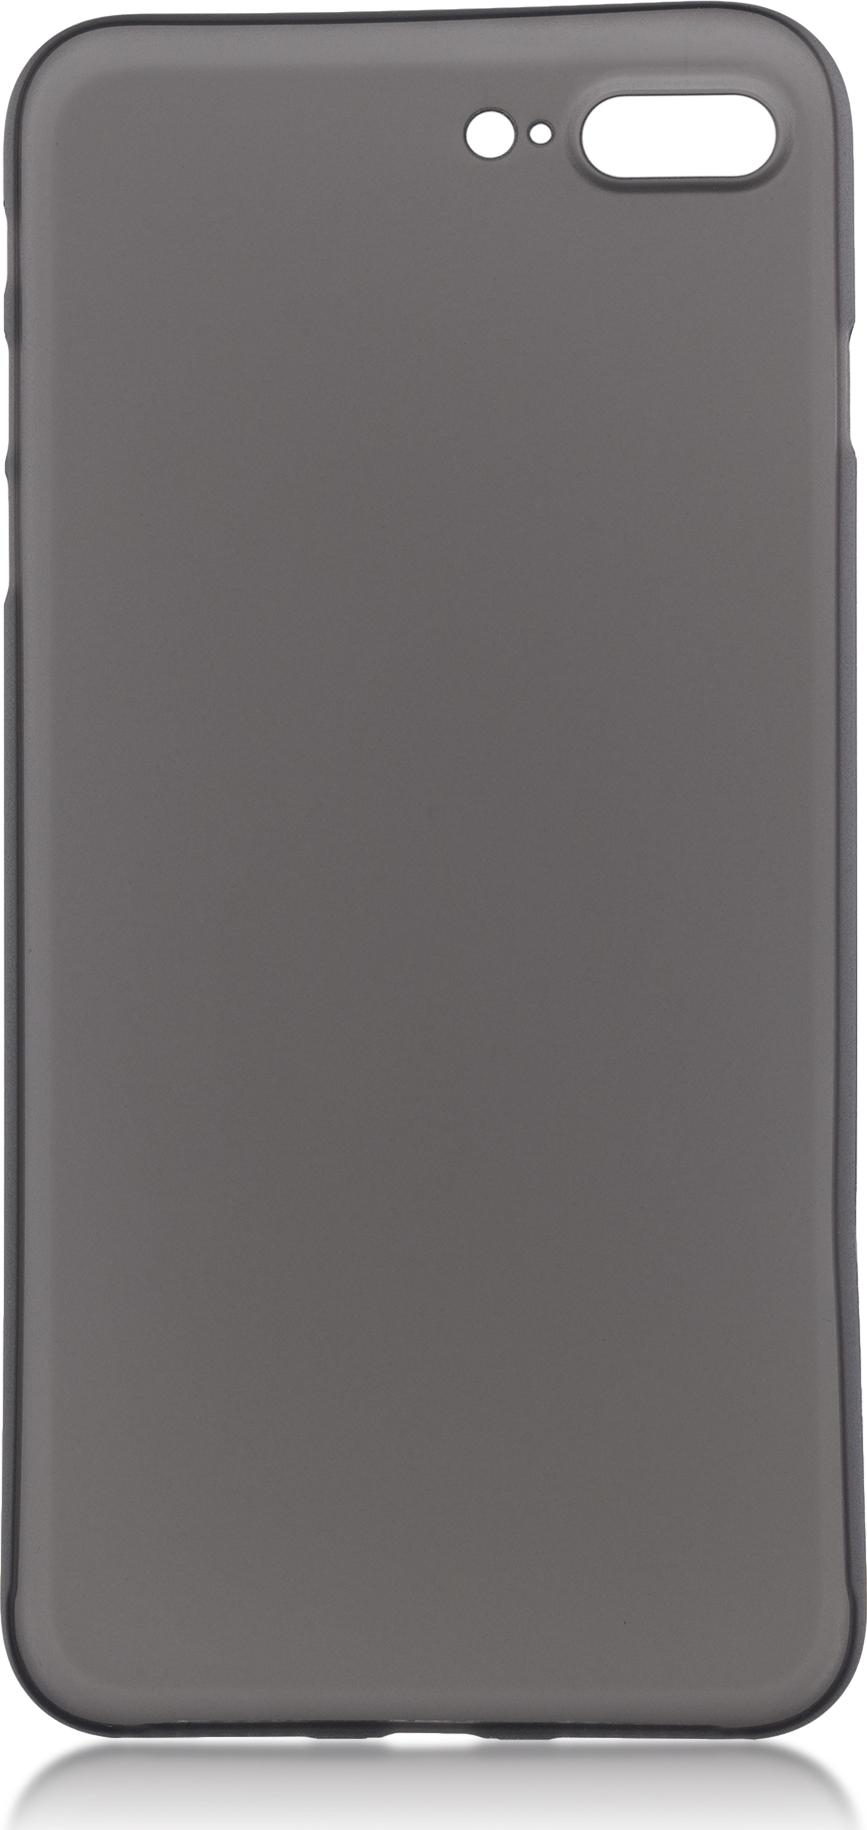 Чехол Brosco SuperSlim для Apple iPhone 7 Plus, черный чехол для сотового телефона brosco superslim для iphone 6 plus ip6p pp superslim blue голубой